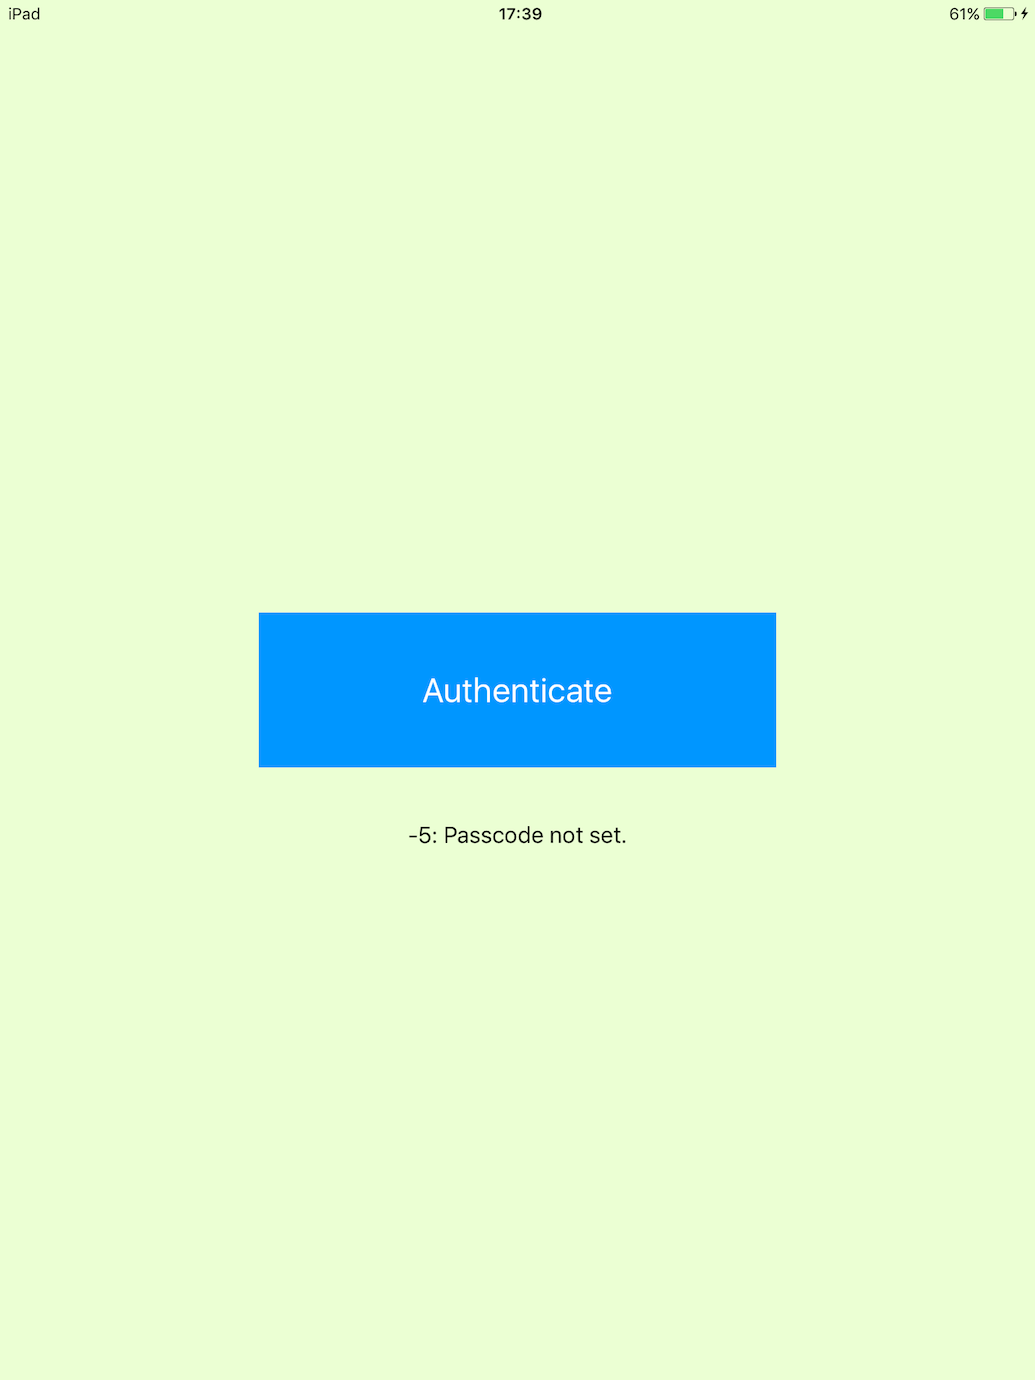 no_passcode.png